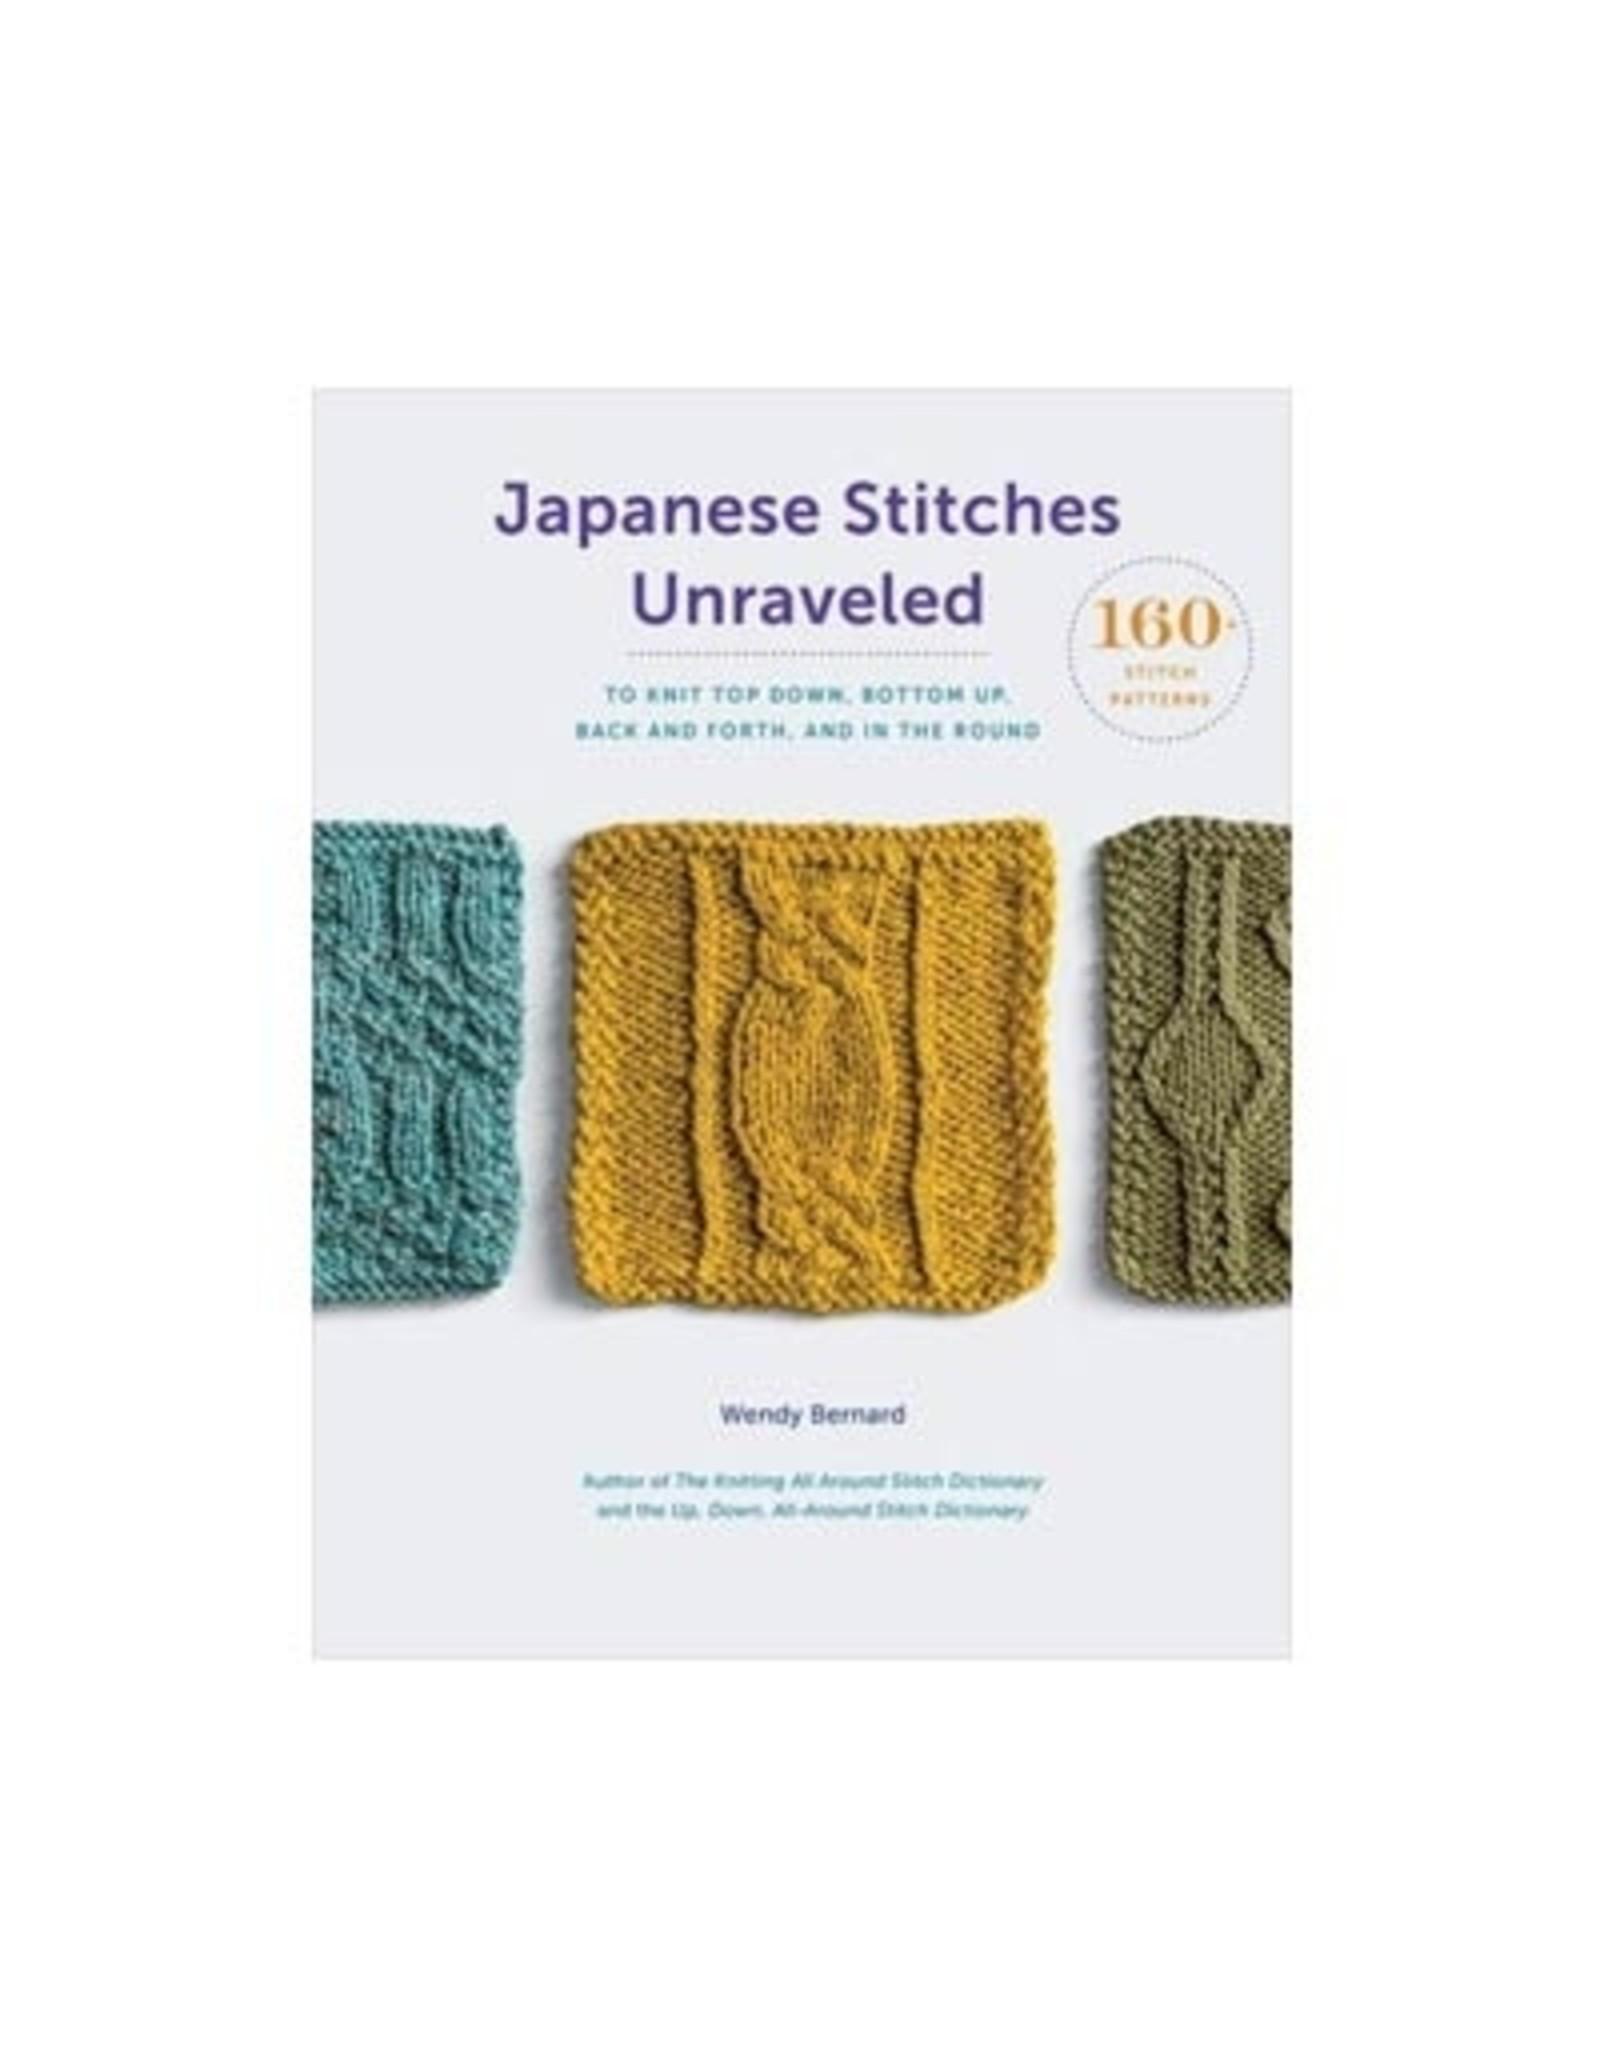 Wendy Bernard - Japanese Stitches Unraveled